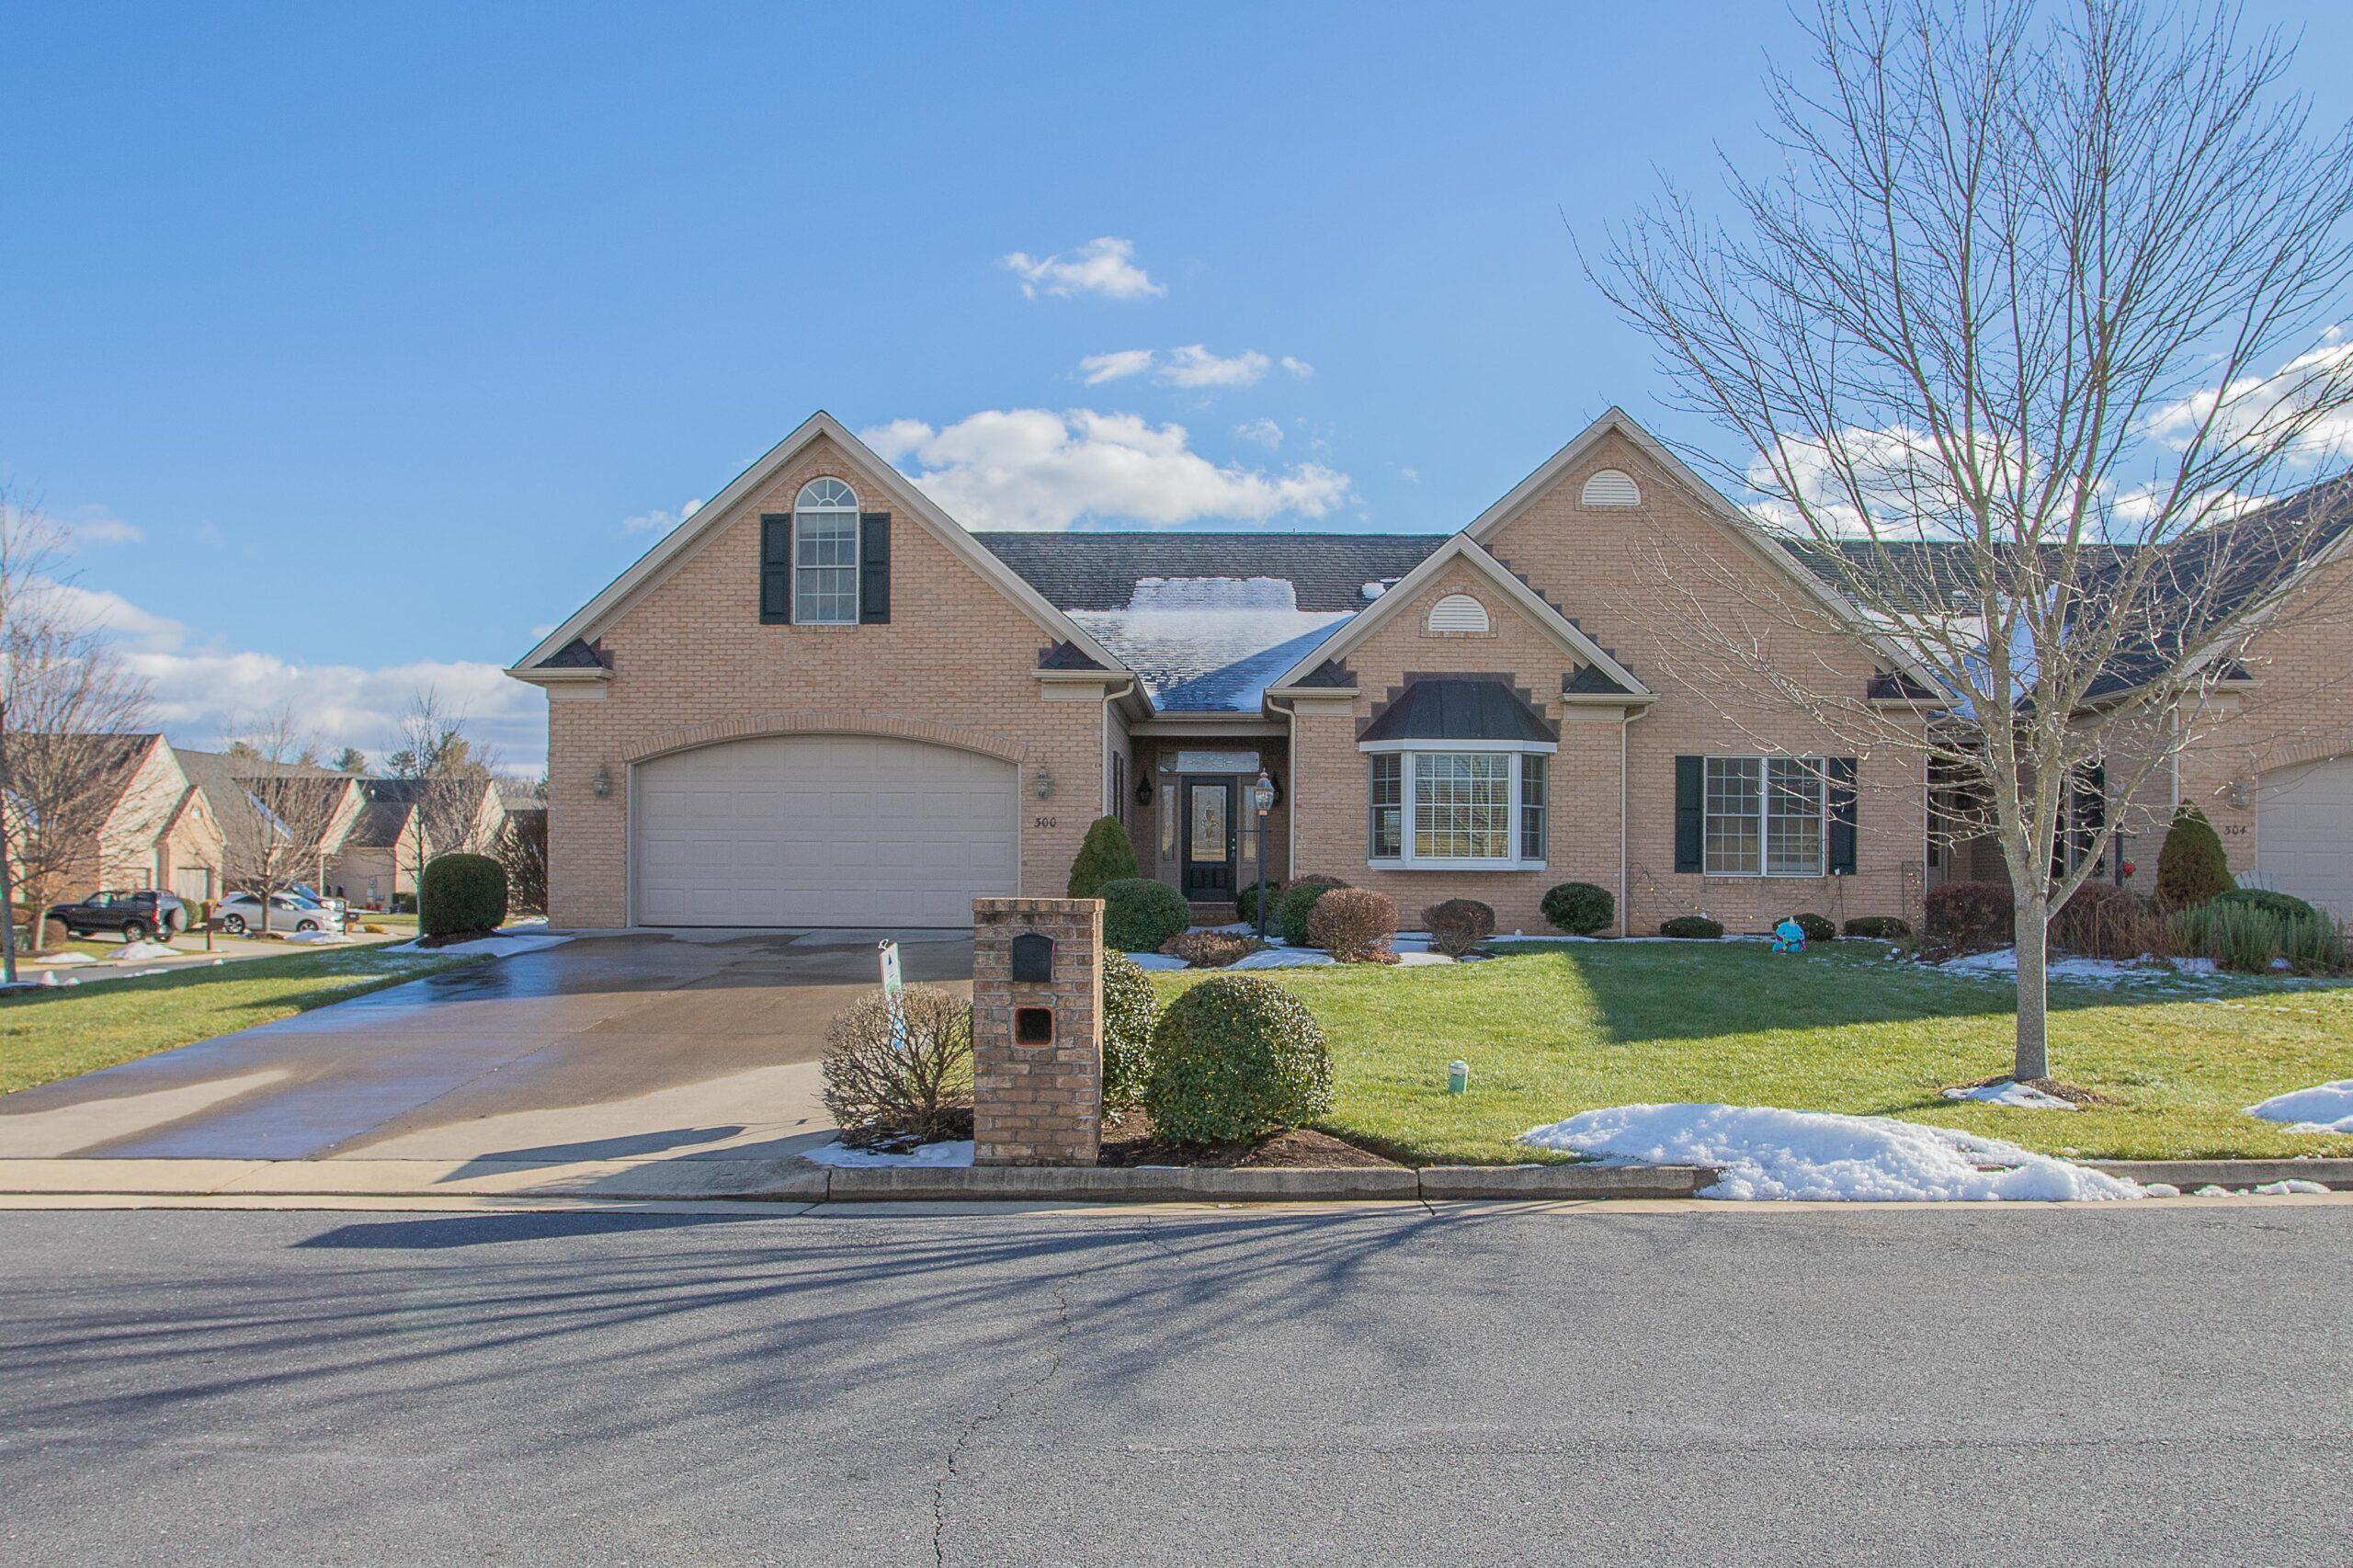 Townhouse for Sale in Waynesboro, 300 Laurel Wood Run